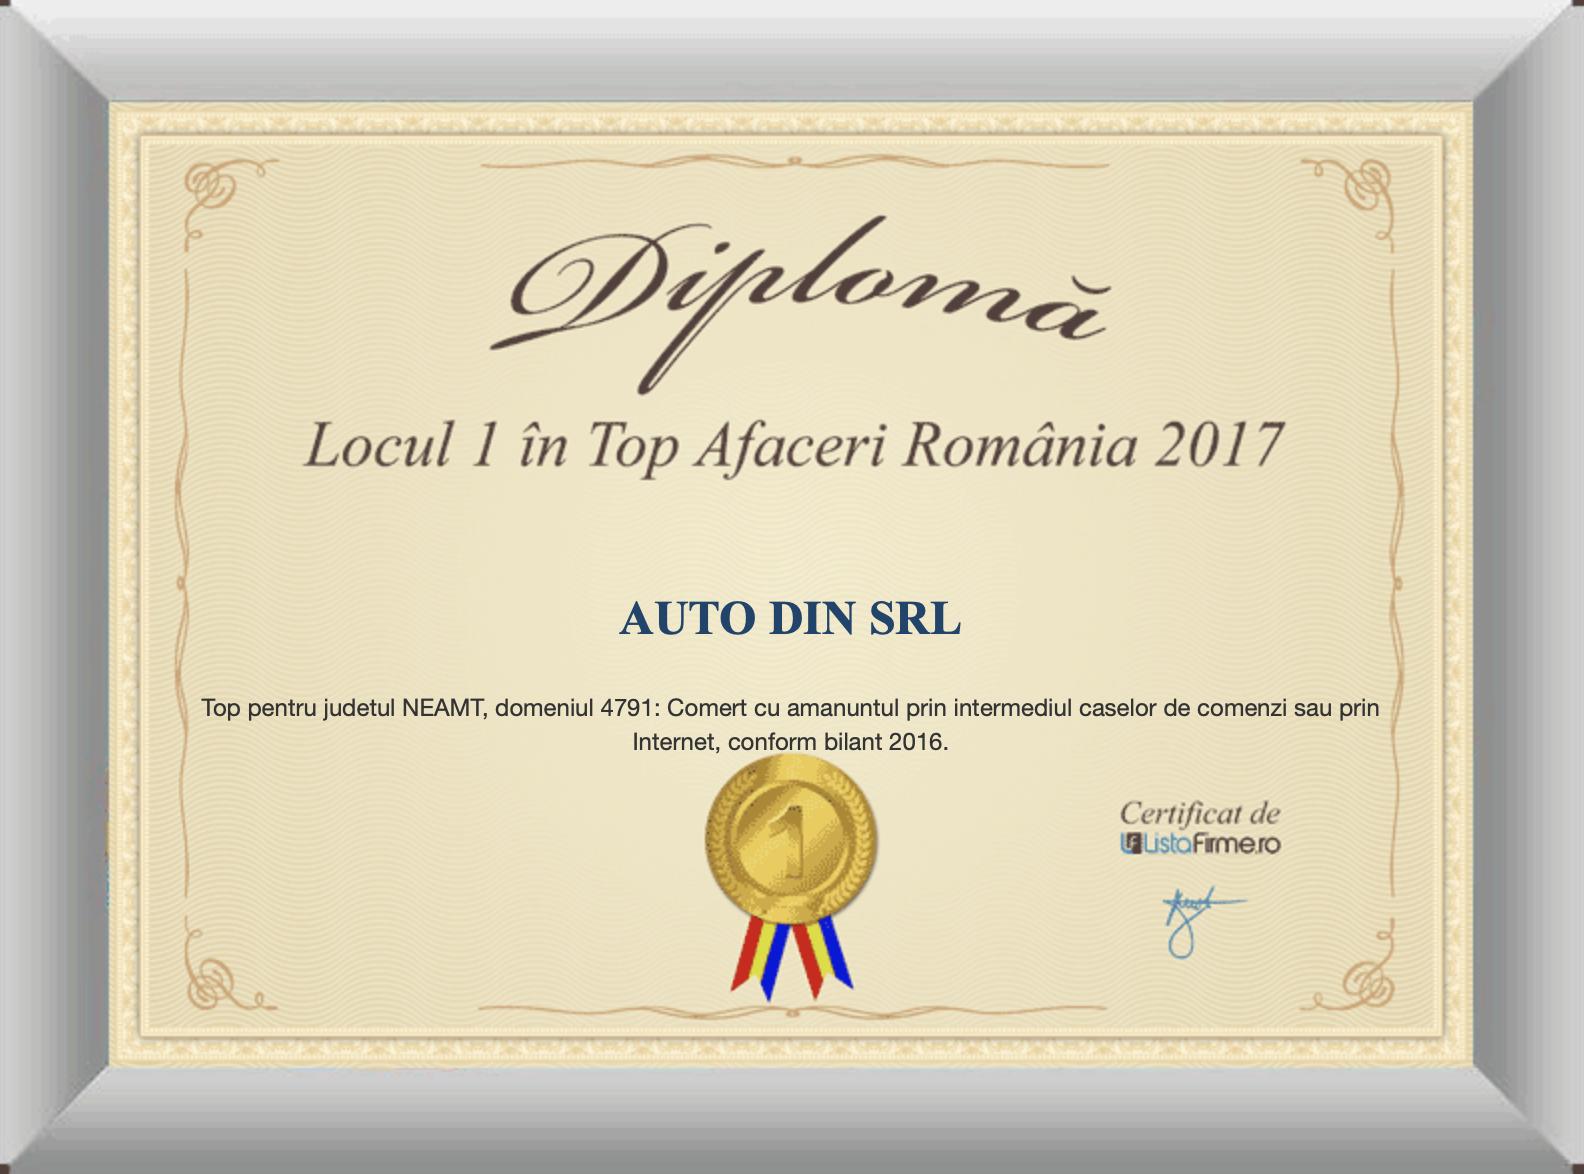 DiplomaAutoDin2017-1